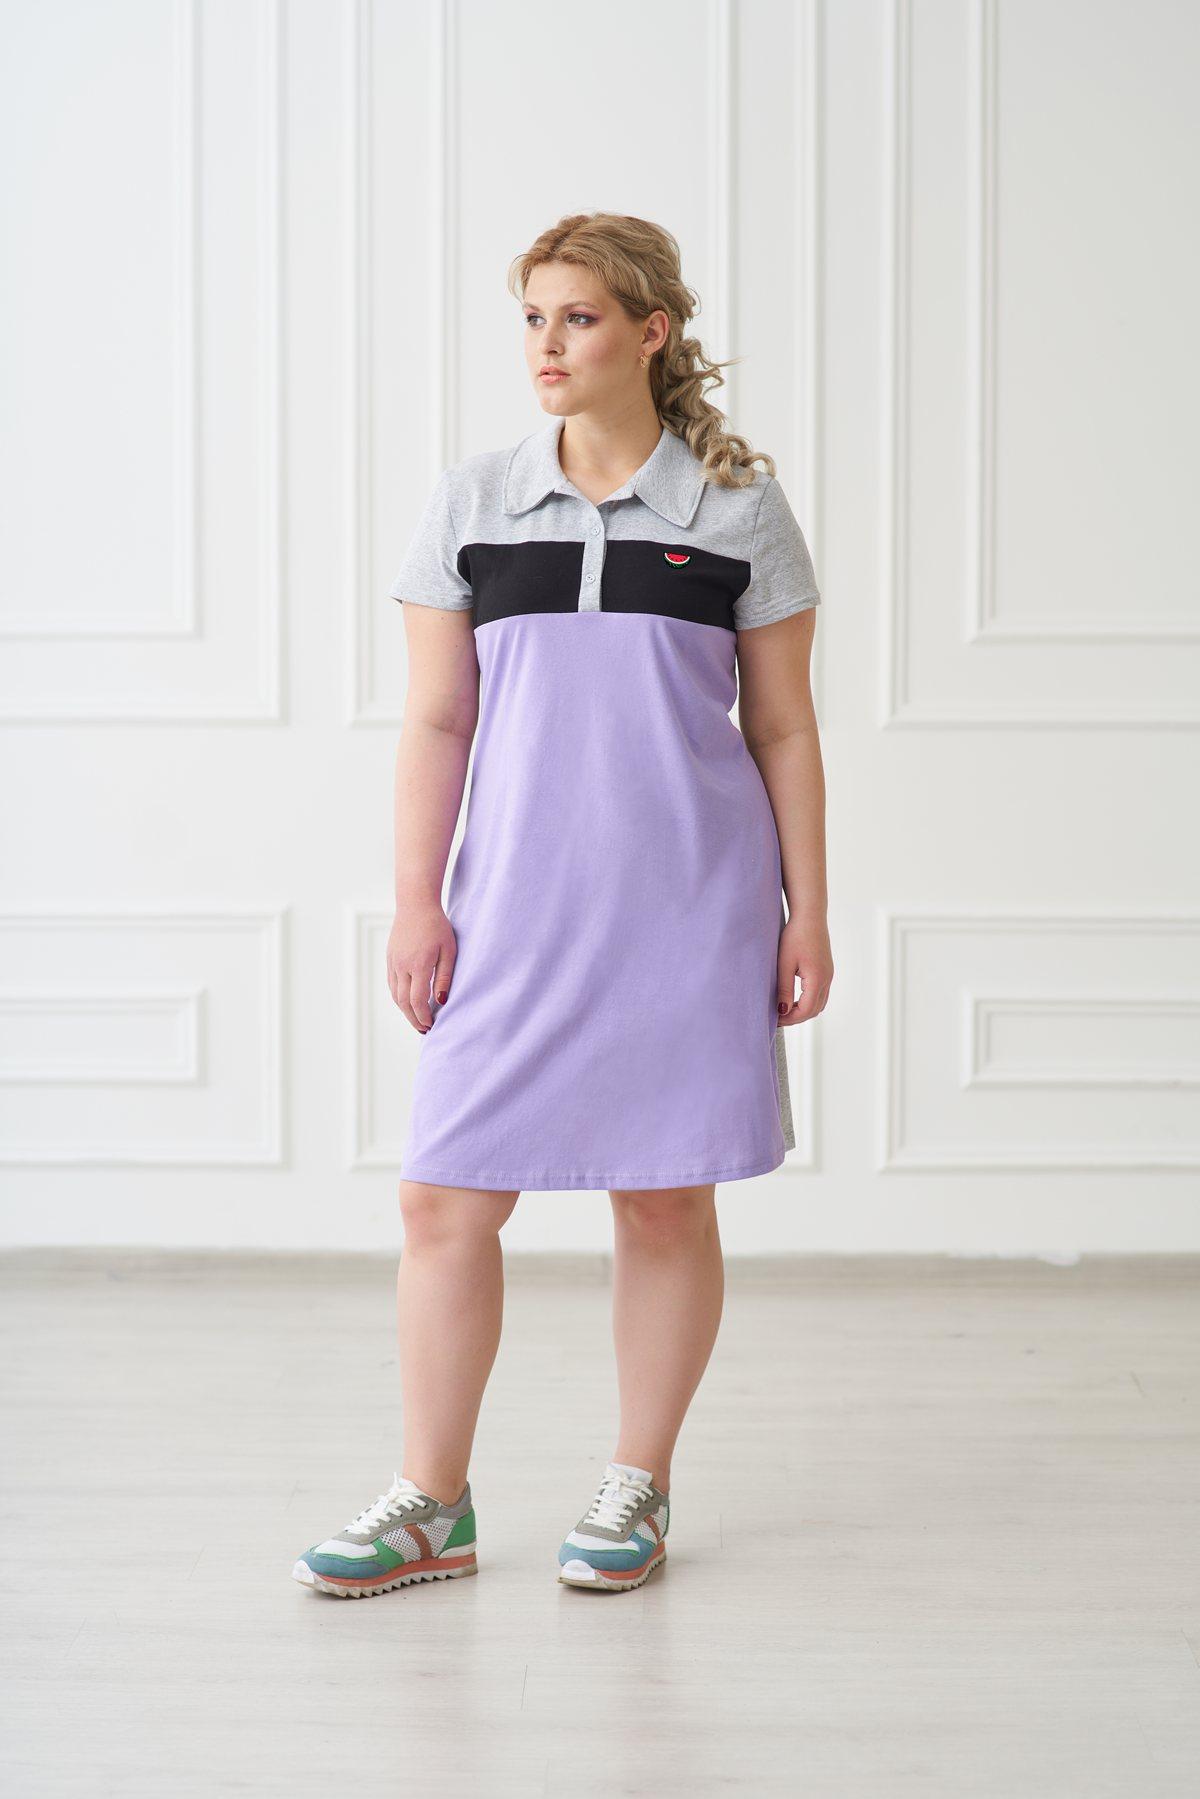 Жен. платье арт. 19-0157 Сирень р. 50Платья<br>Факт. ОГ: 100 см <br>Факт. ОТ: 98 см <br>Факт. ОБ: 104 см <br>Длина по спинке: 94 см<br><br>Тип: Жен. платье<br>Размер: 50<br>Материал: Трикотаж